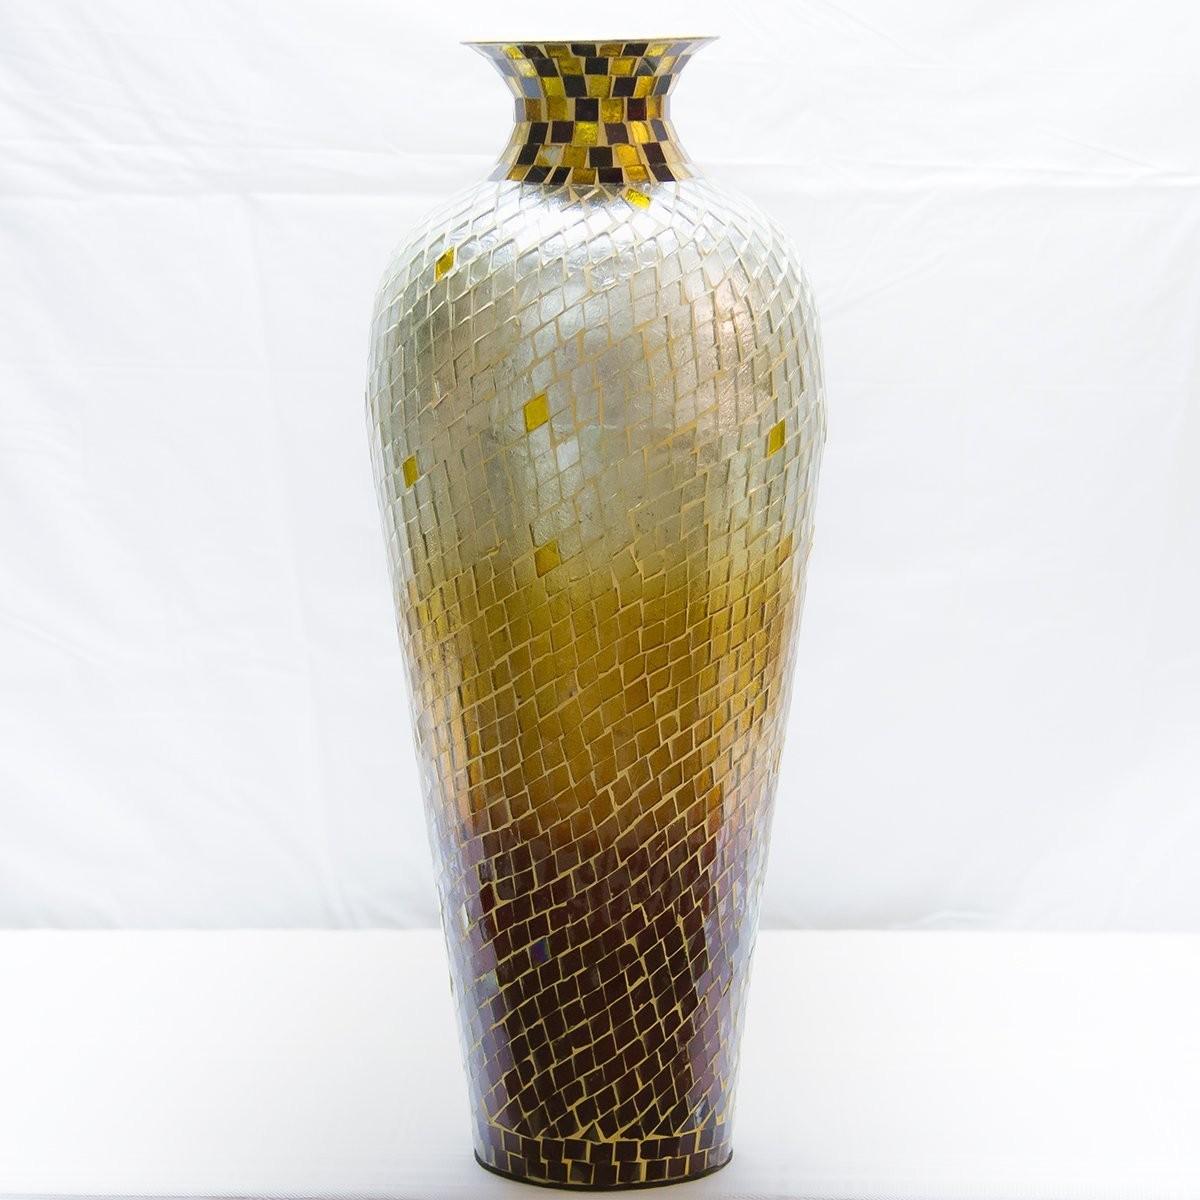 Buy 20 amphora nouveau vase metal floor vase with decorative buy 20 amphora nouveau vase metal floor vase with decorative glass mosaic overlay decorshore reviewsmspy